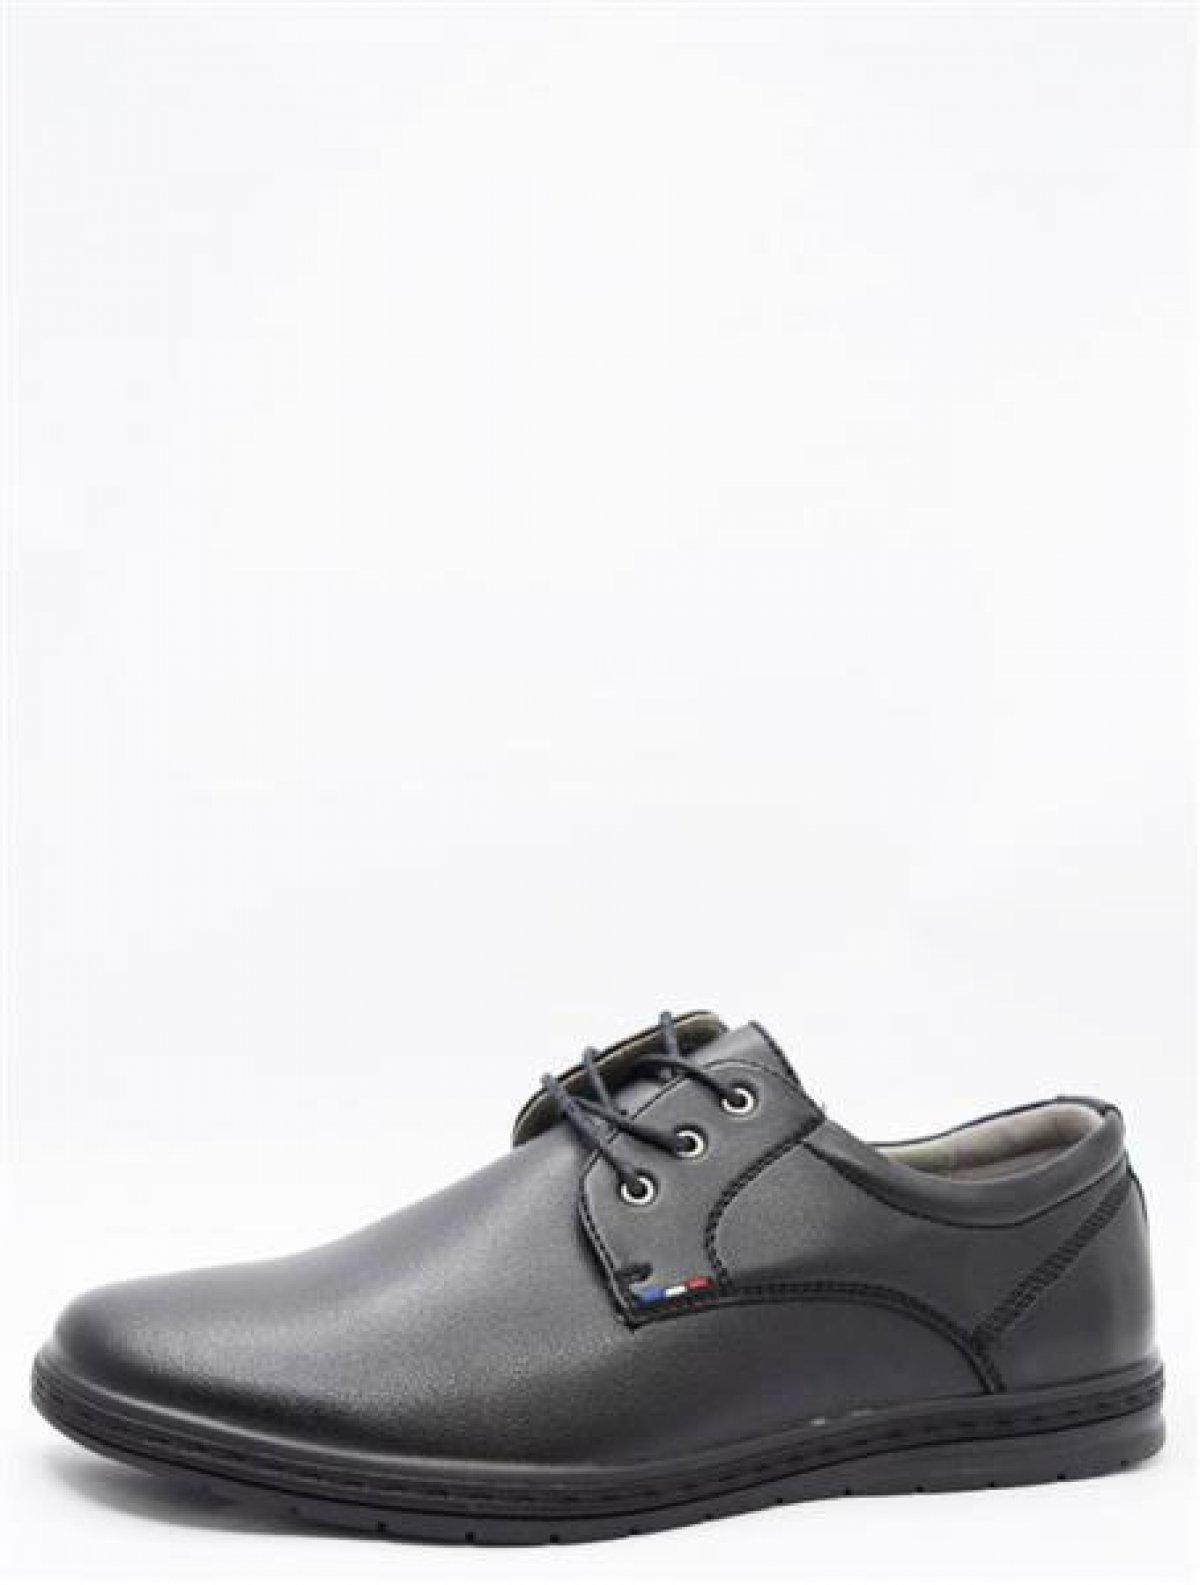 Carido 15113 мужские туфли